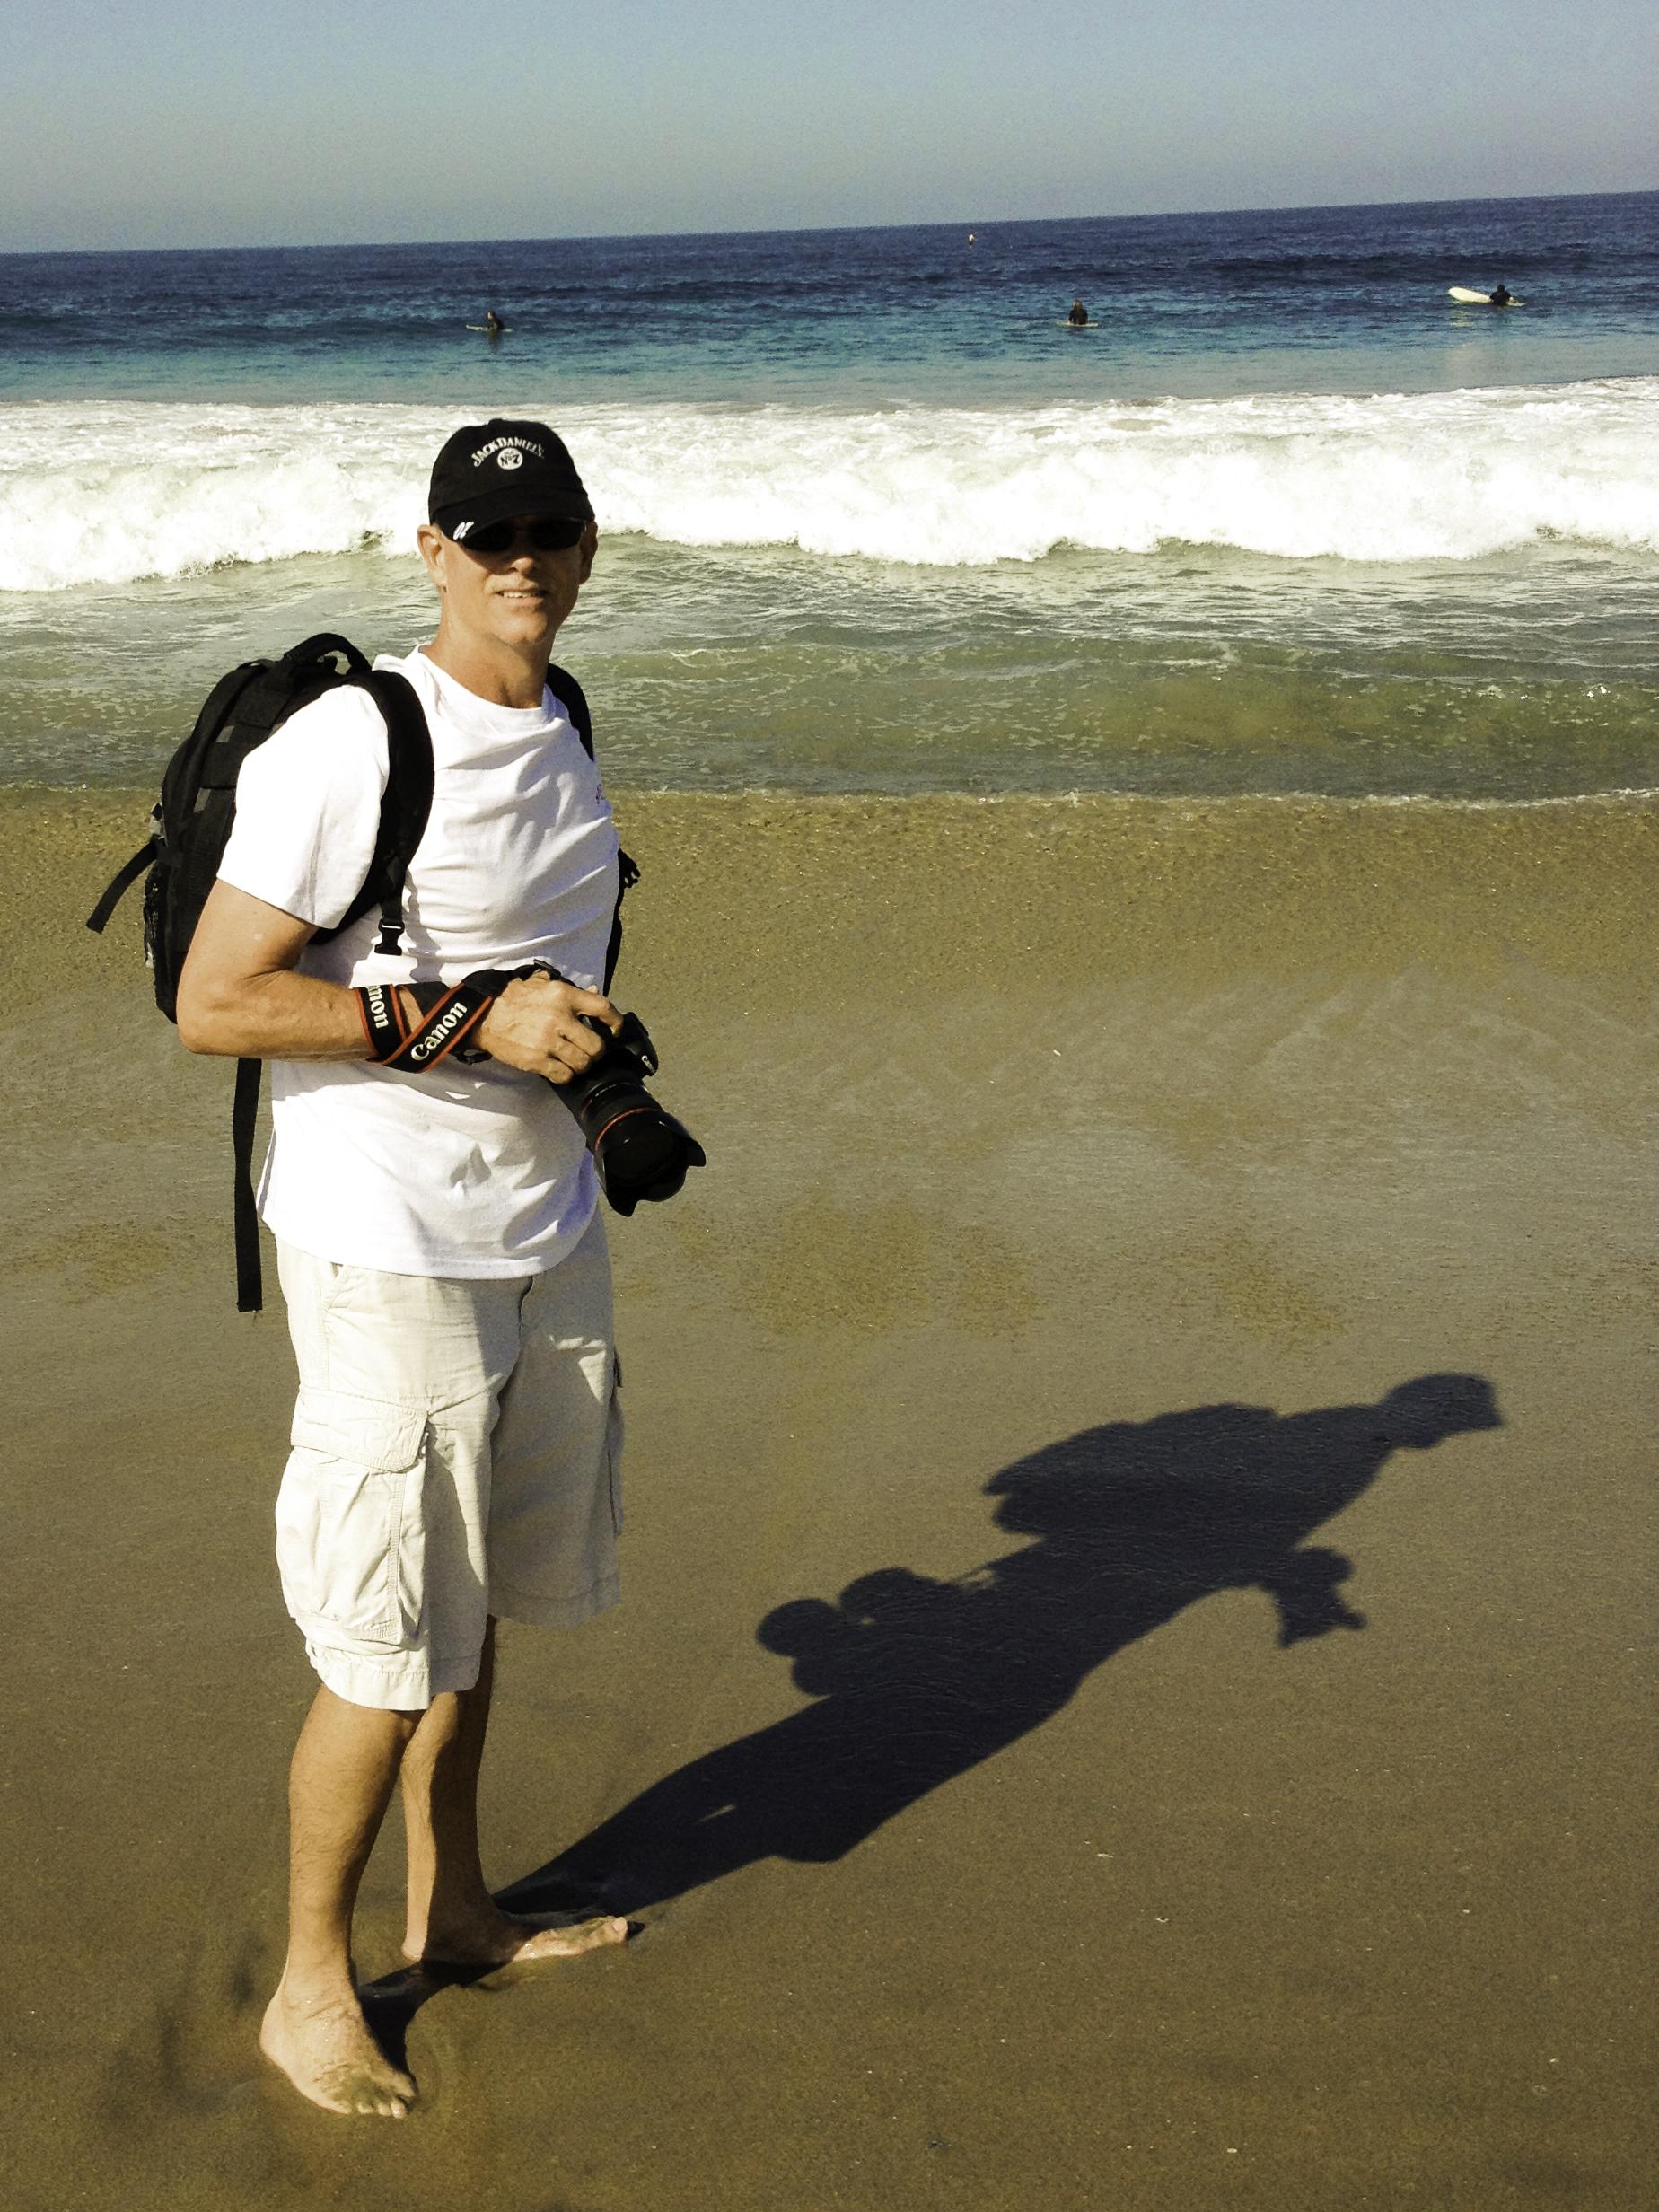 On a California beach...